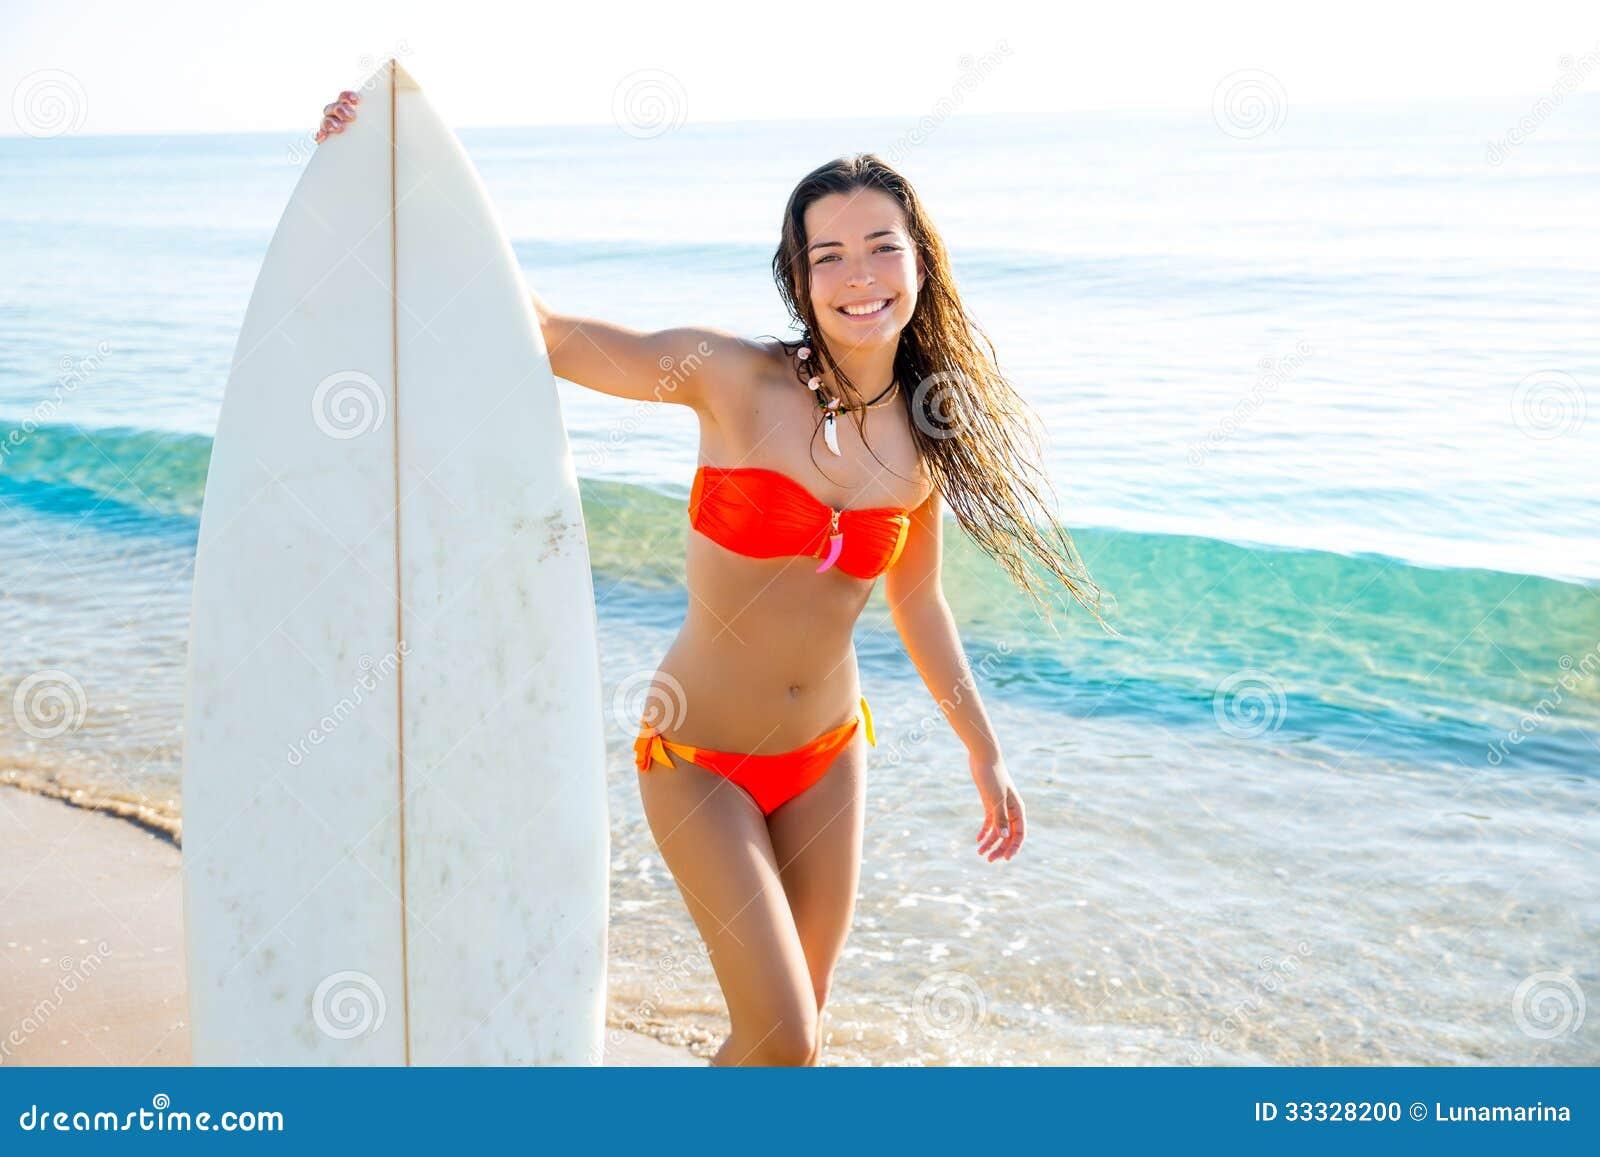 Filles bikini youtube adolescents bikini